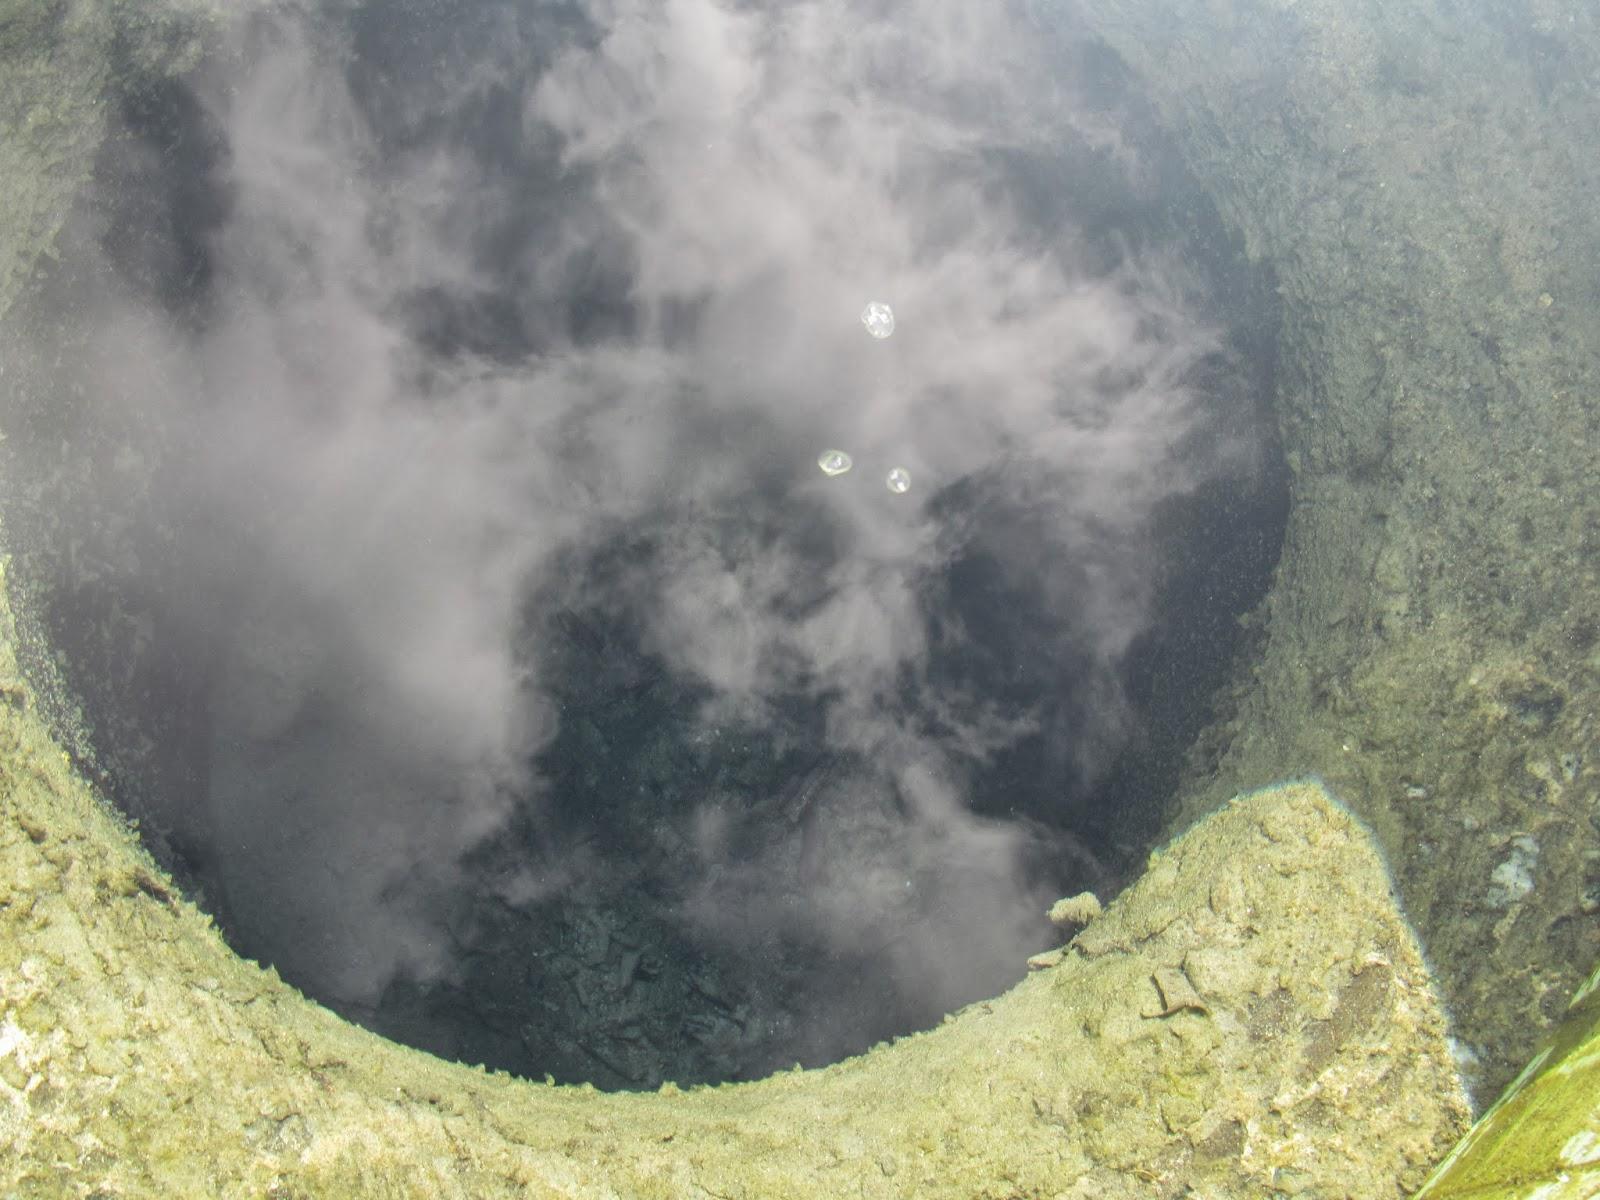 Third is Maha Oya Hot Springs